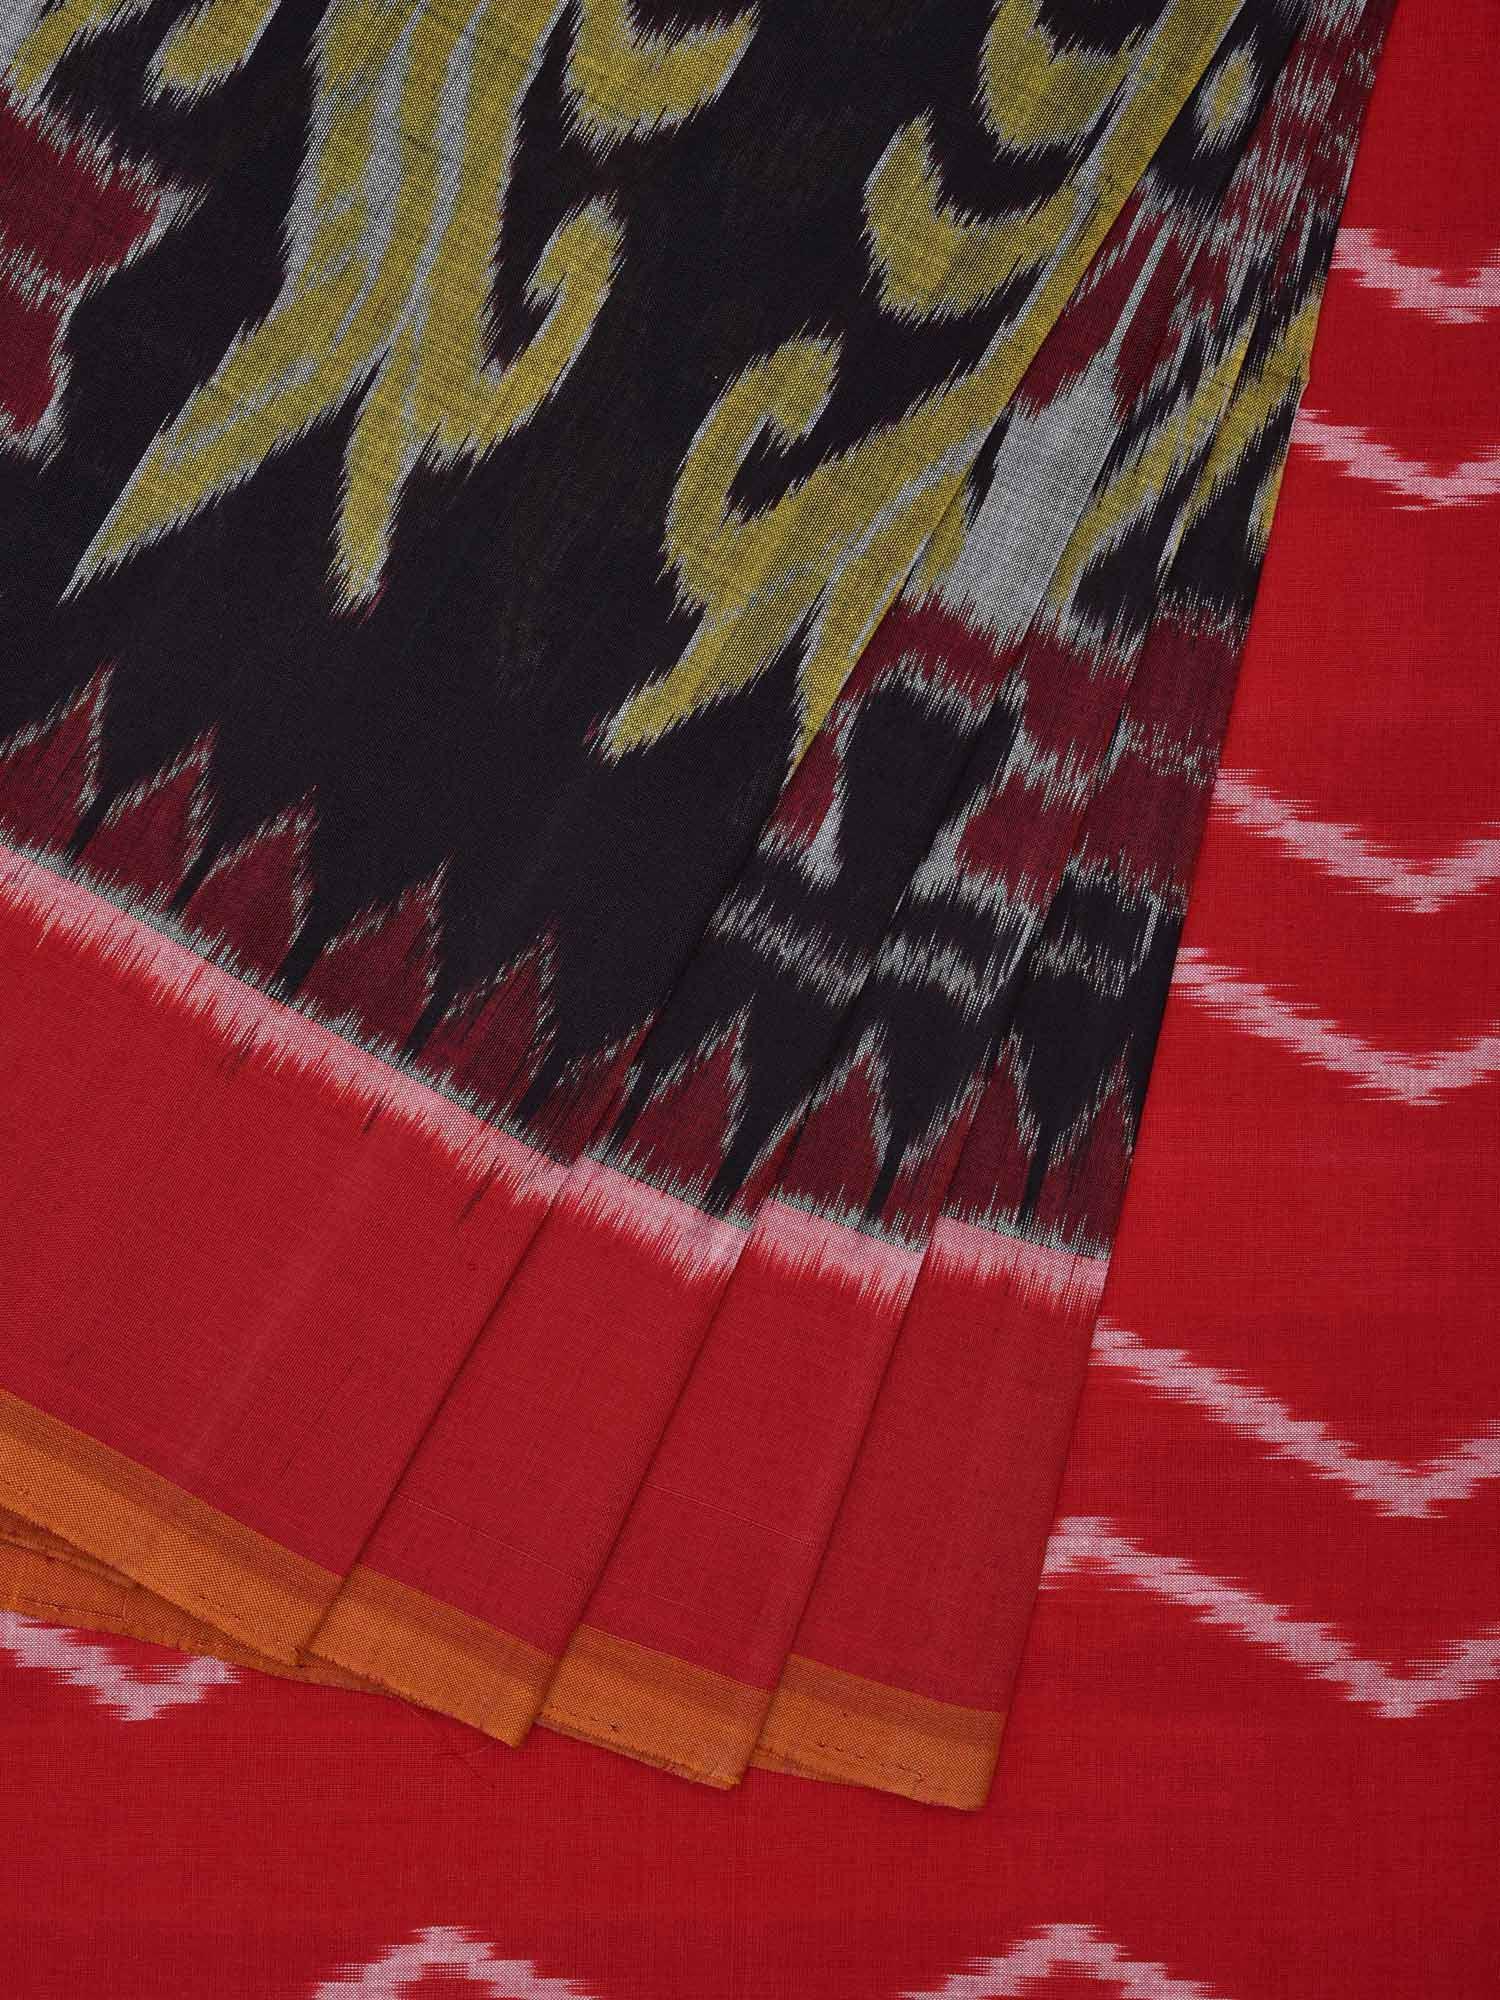 bfbc19dd206feb Red and Black Pochampally Ikat Cotton Handloom Saree with Peacock Design -  Uppada Sarees - 2782062